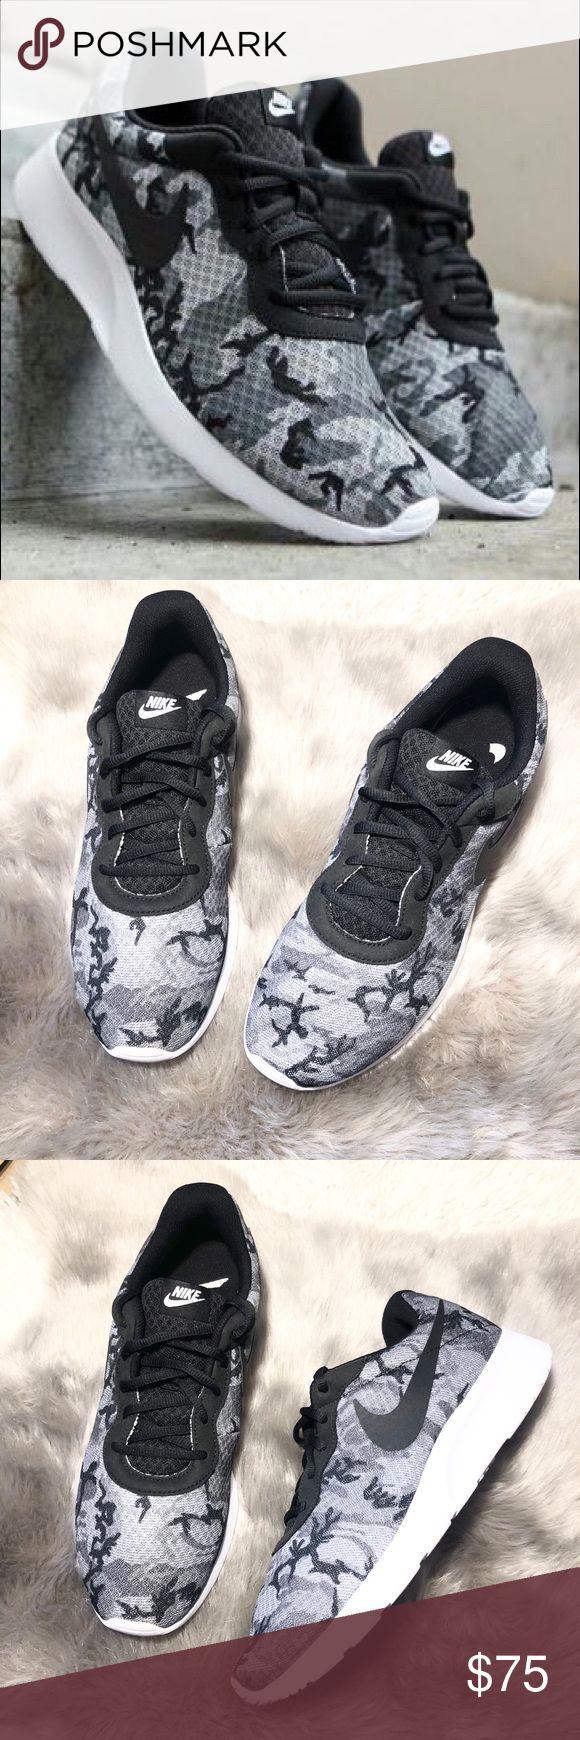 Nike Tanjun Print Running Sneakers Size 10